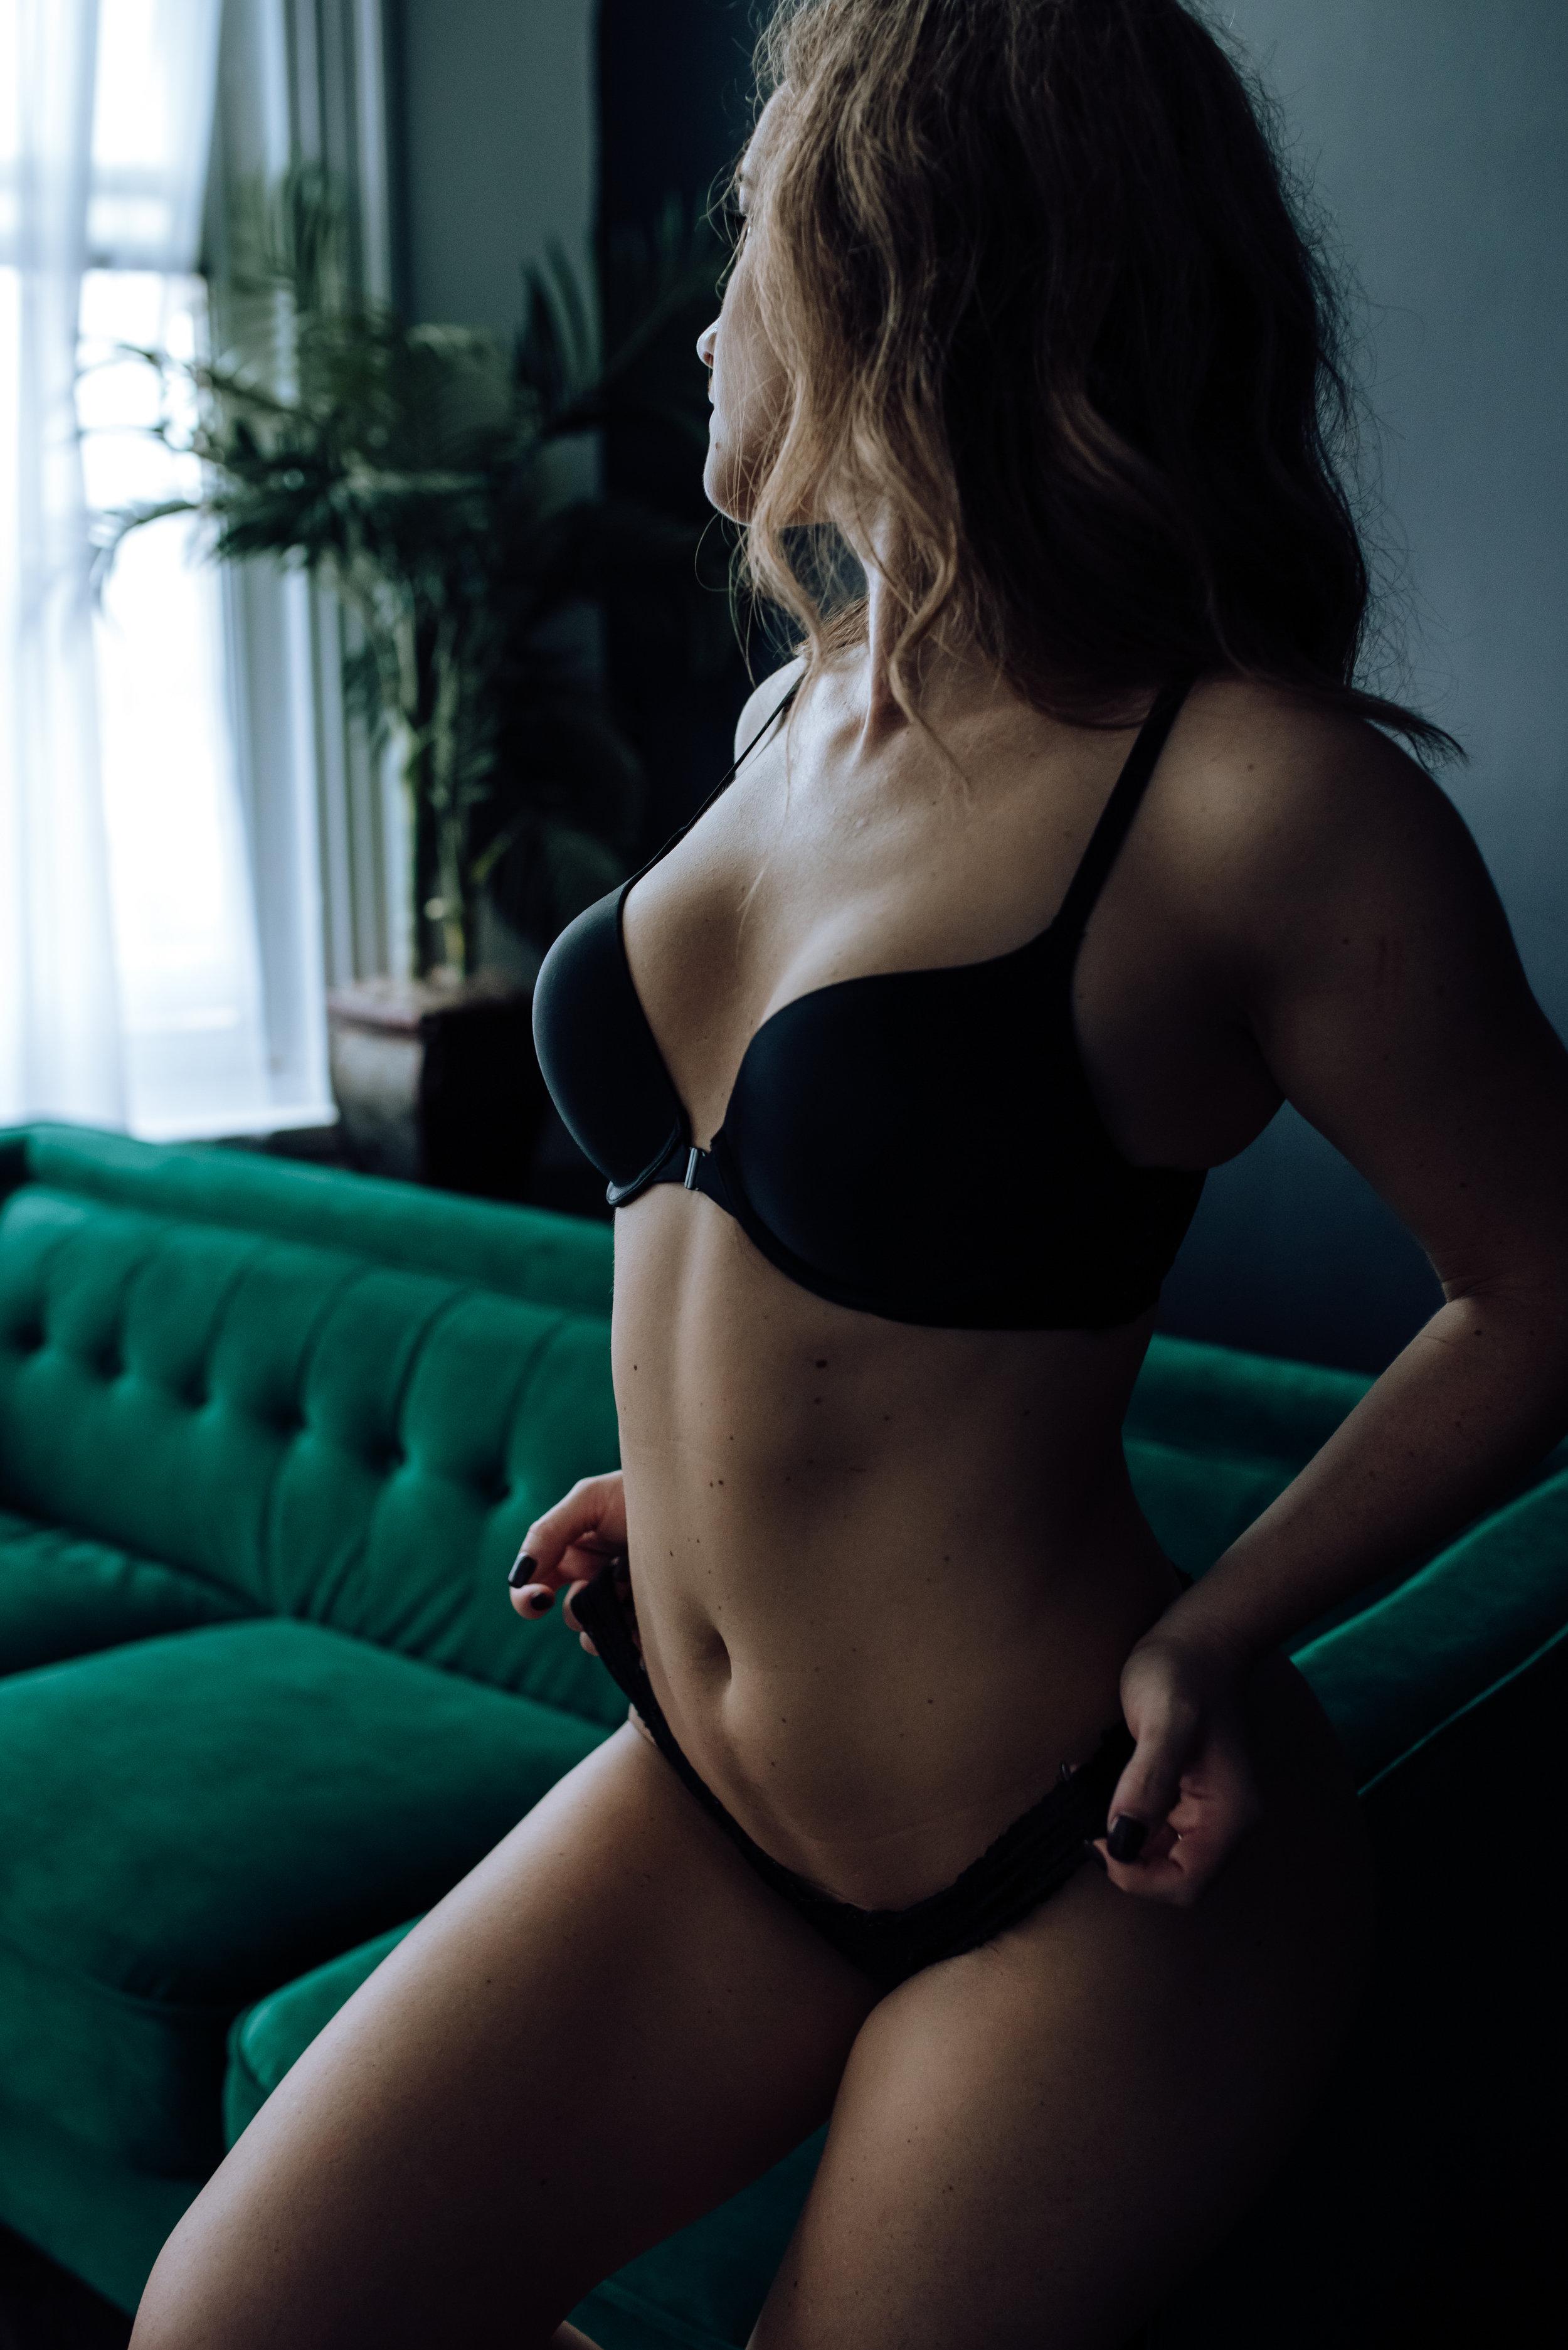 boudoir-photography-best-in-berks-32.jpg